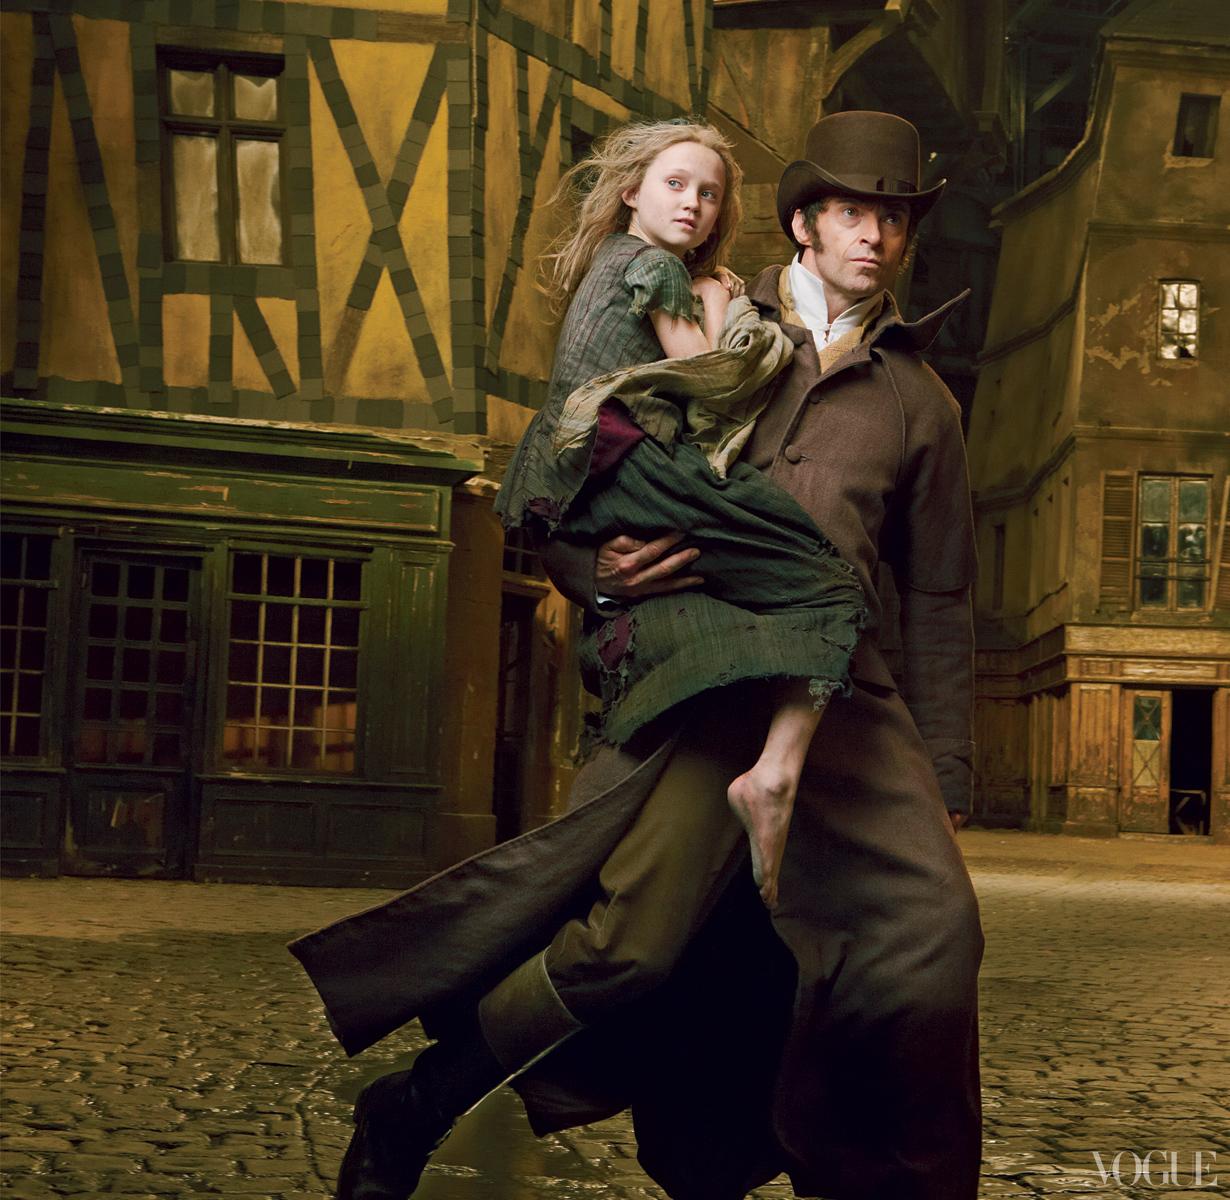 http://4.bp.blogspot.com/-3a6tqeZgIT8/UKbQKE-saKI/AAAAAAAACx4/sBe-Y69MKds/s1600/Les-Miserables-poster-Hugh-Jackman-and-Isabelle-Allen.jpg